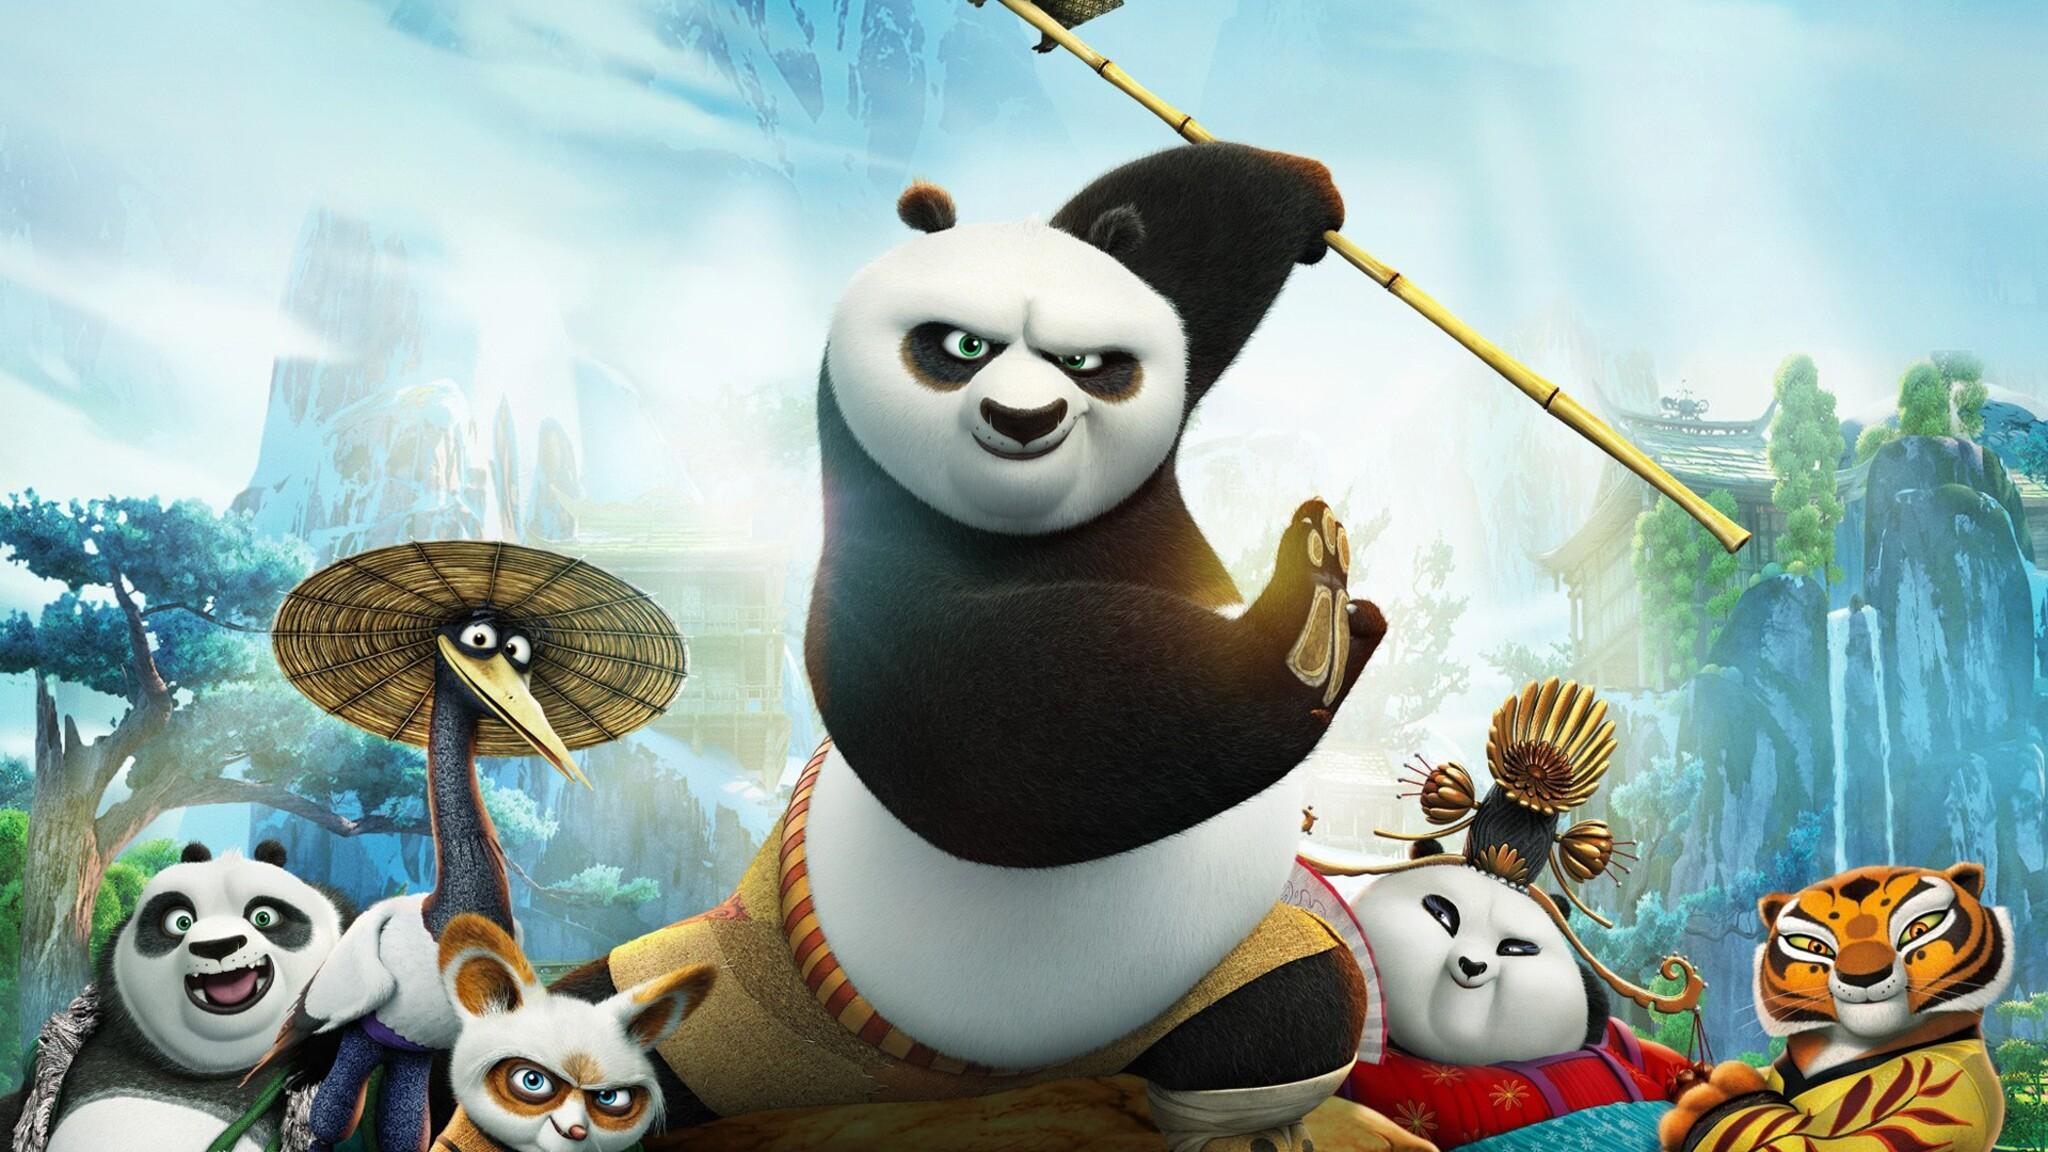 HD Panda Wallpapers HD, Desktop Backgrounds 2048x1152 Downloads ...